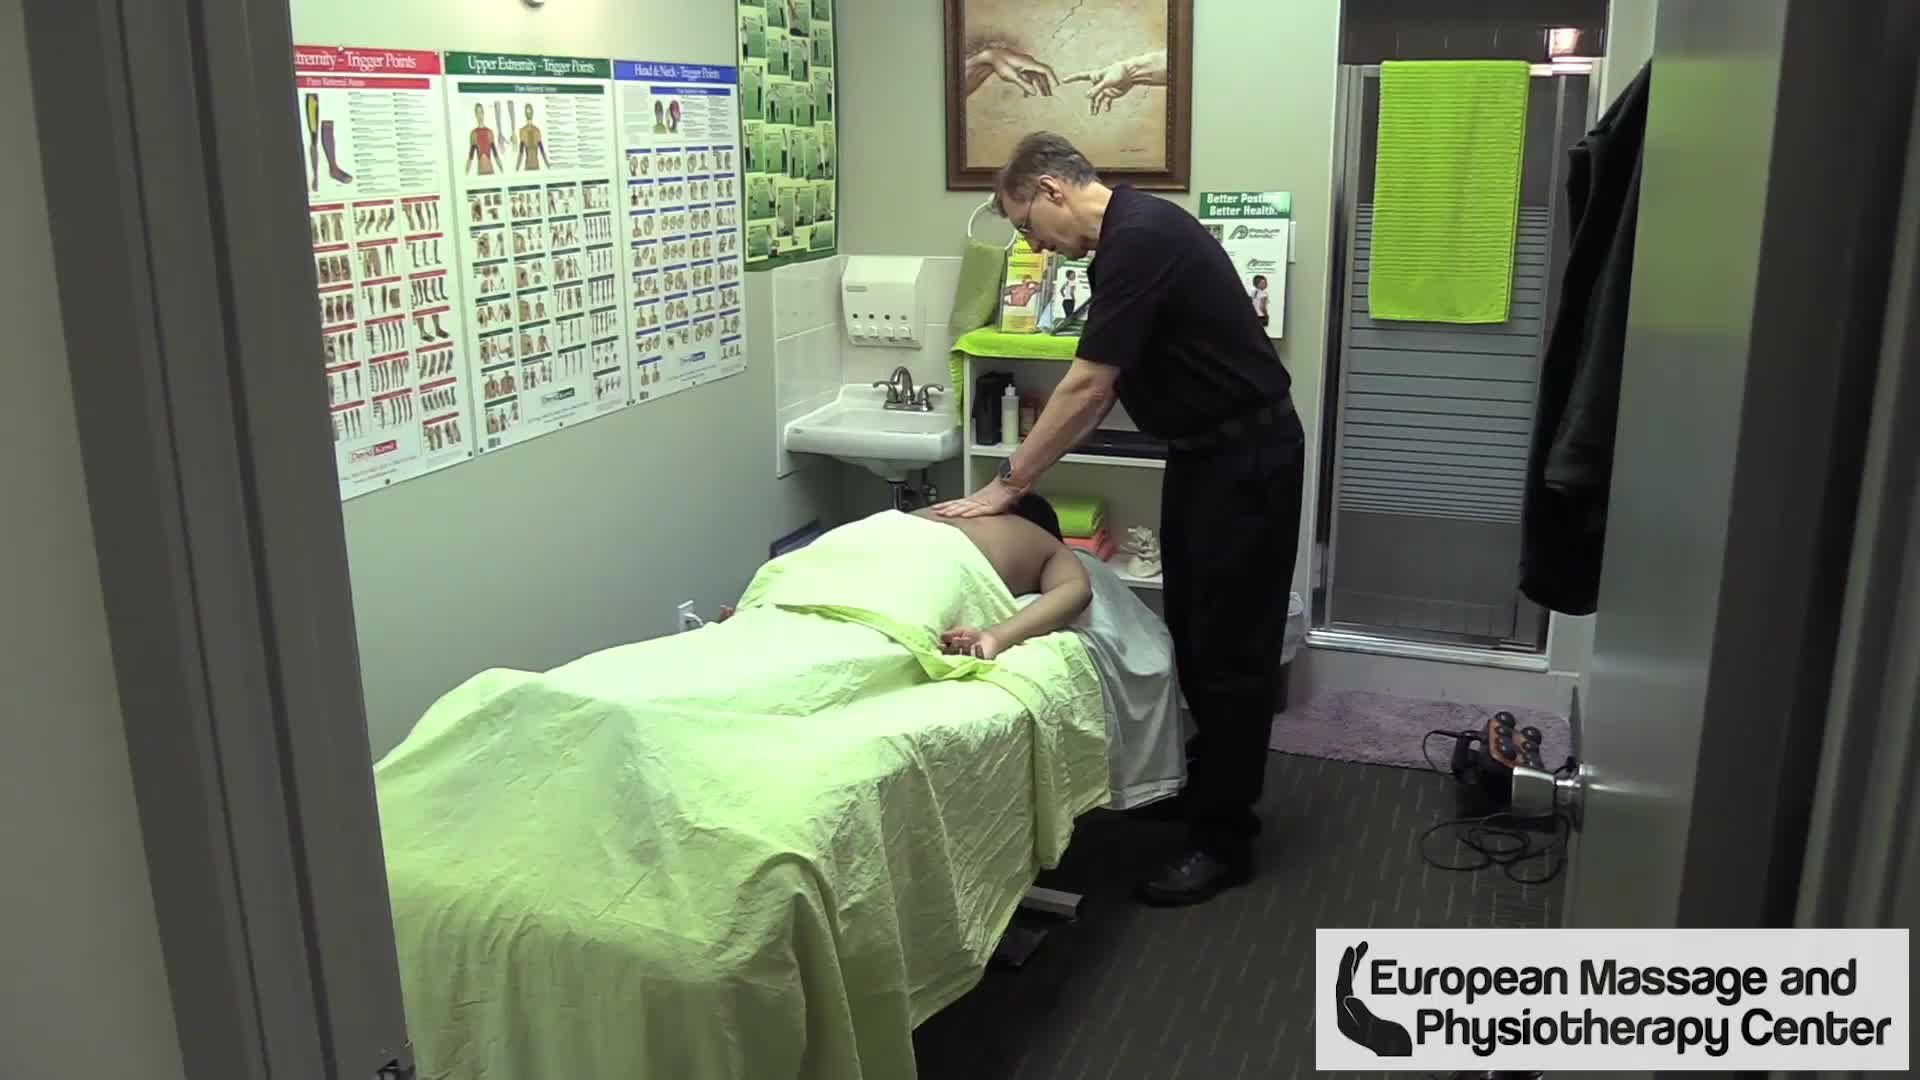 European Massage & Physiotherapy Center - Massage Therapists - 905-270-5553